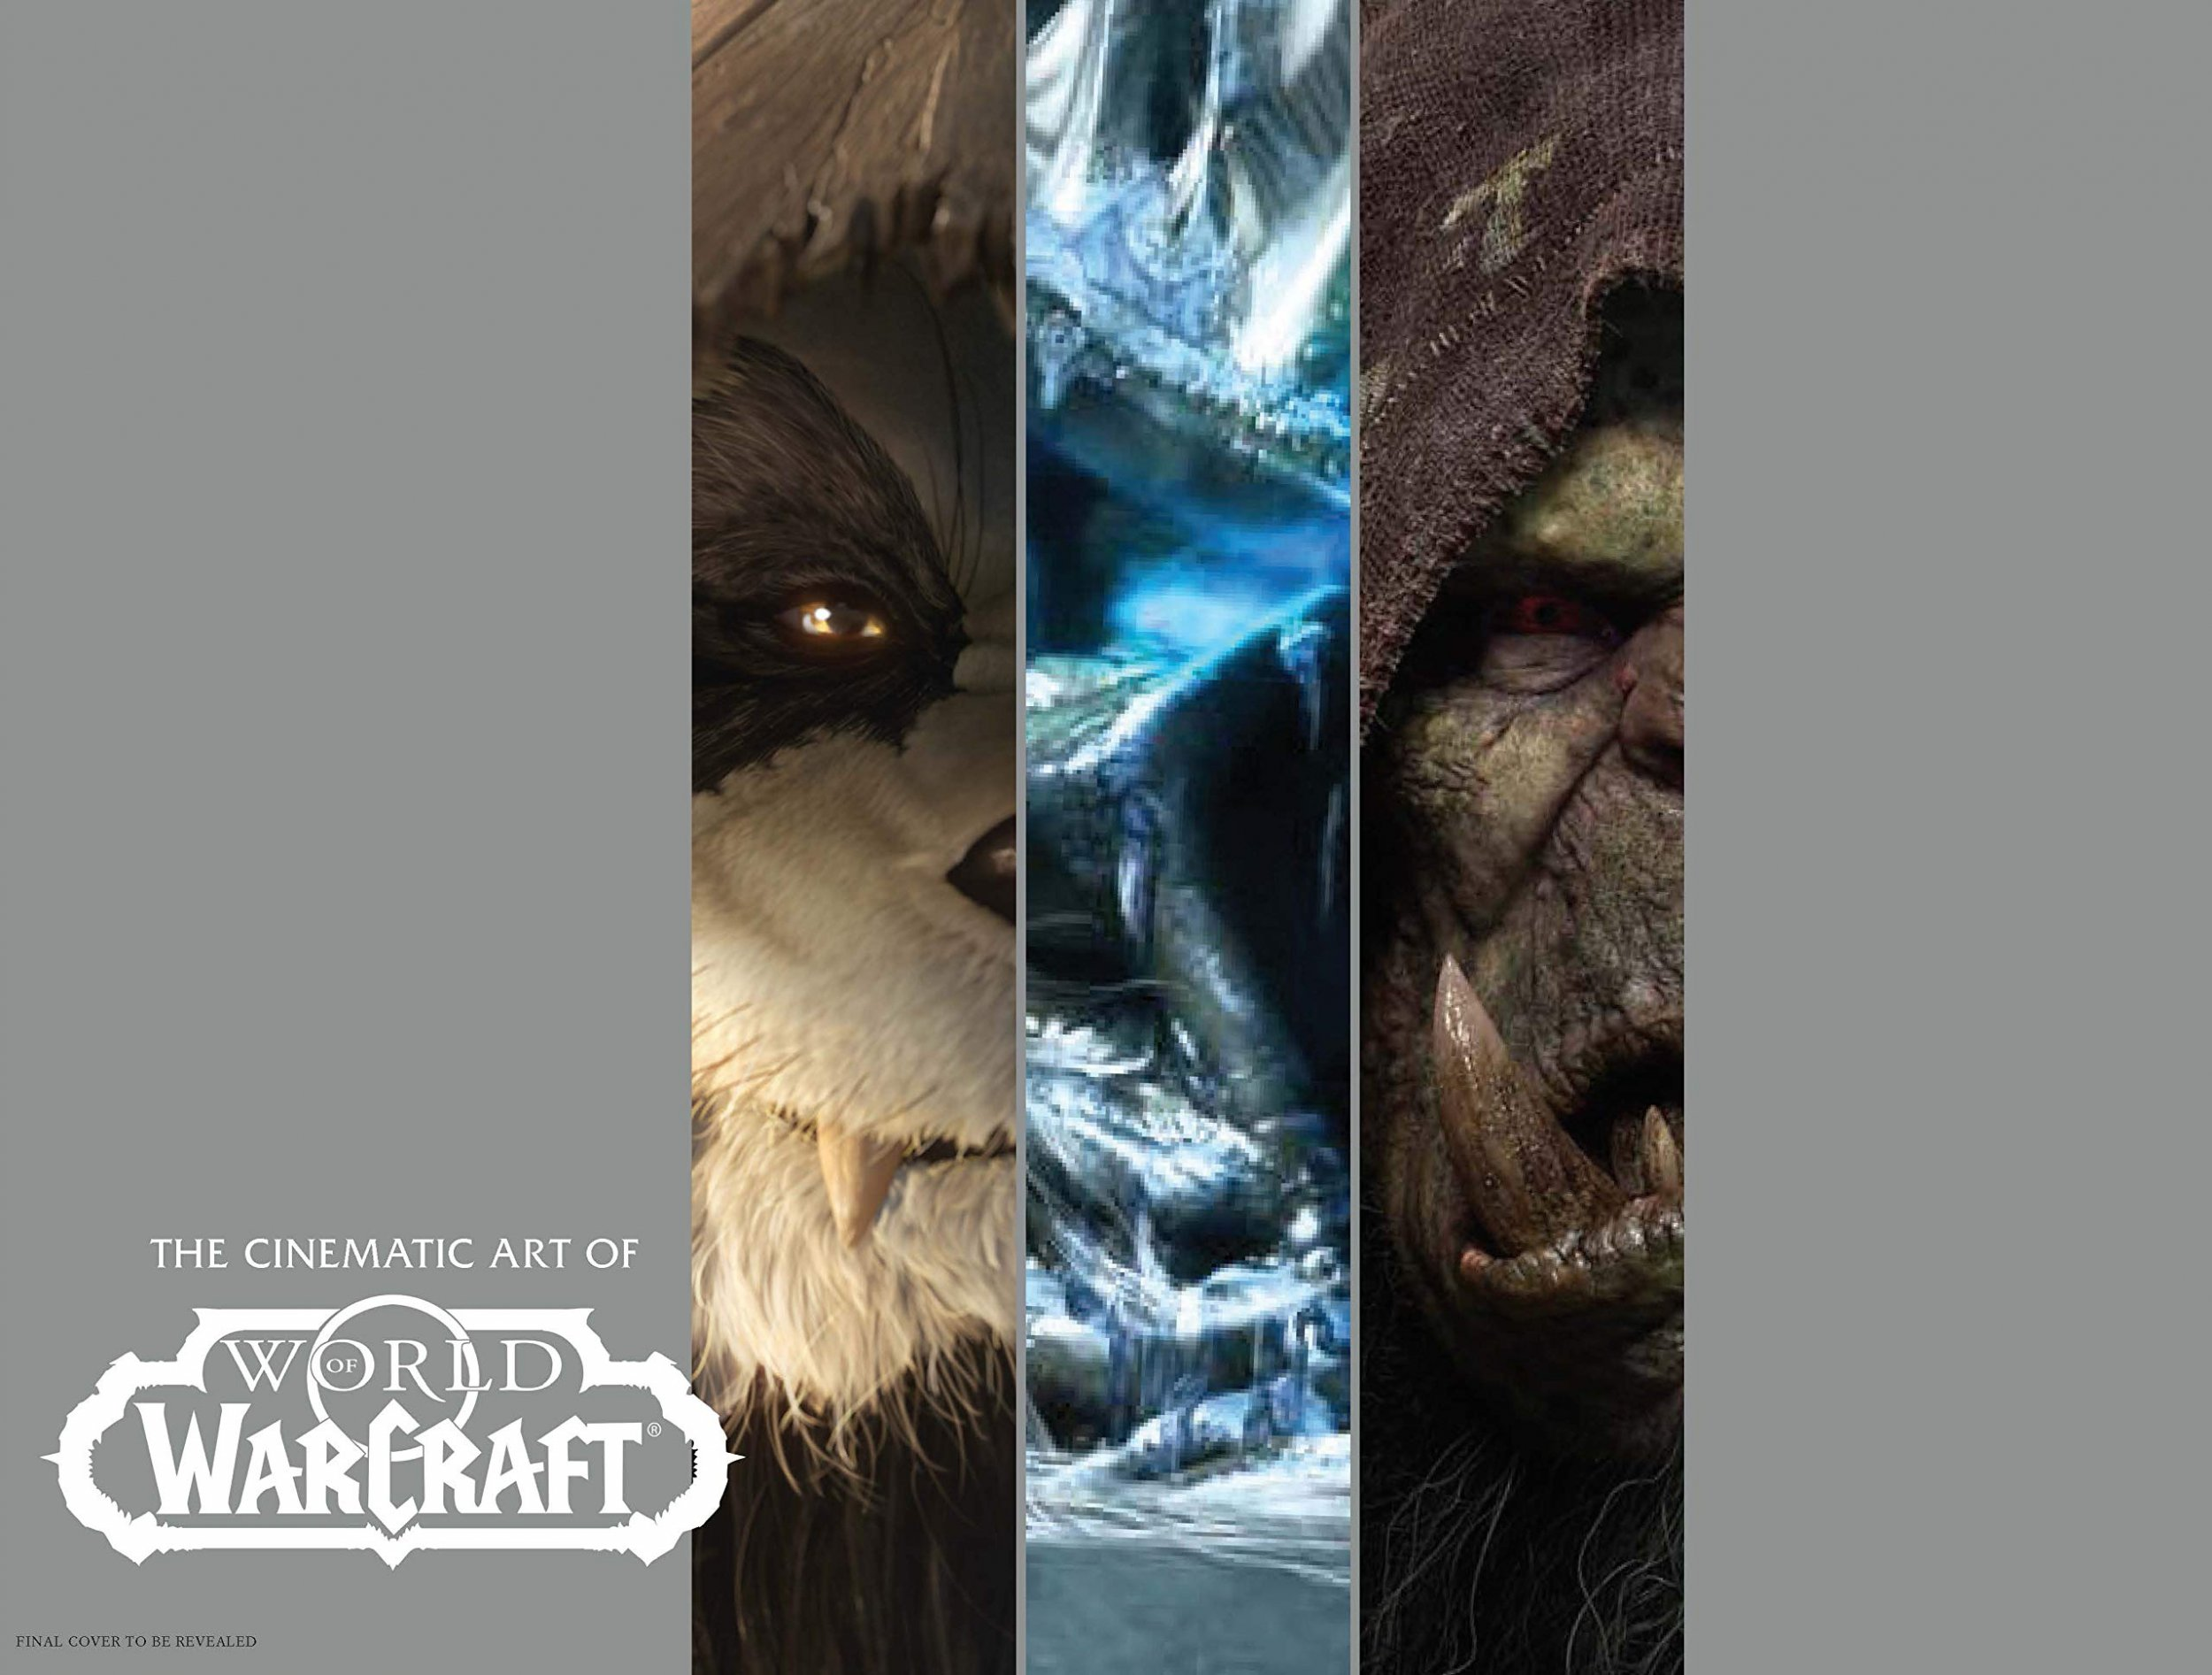 World of Warcraft - The Cinematic Art of World of Wartcraft